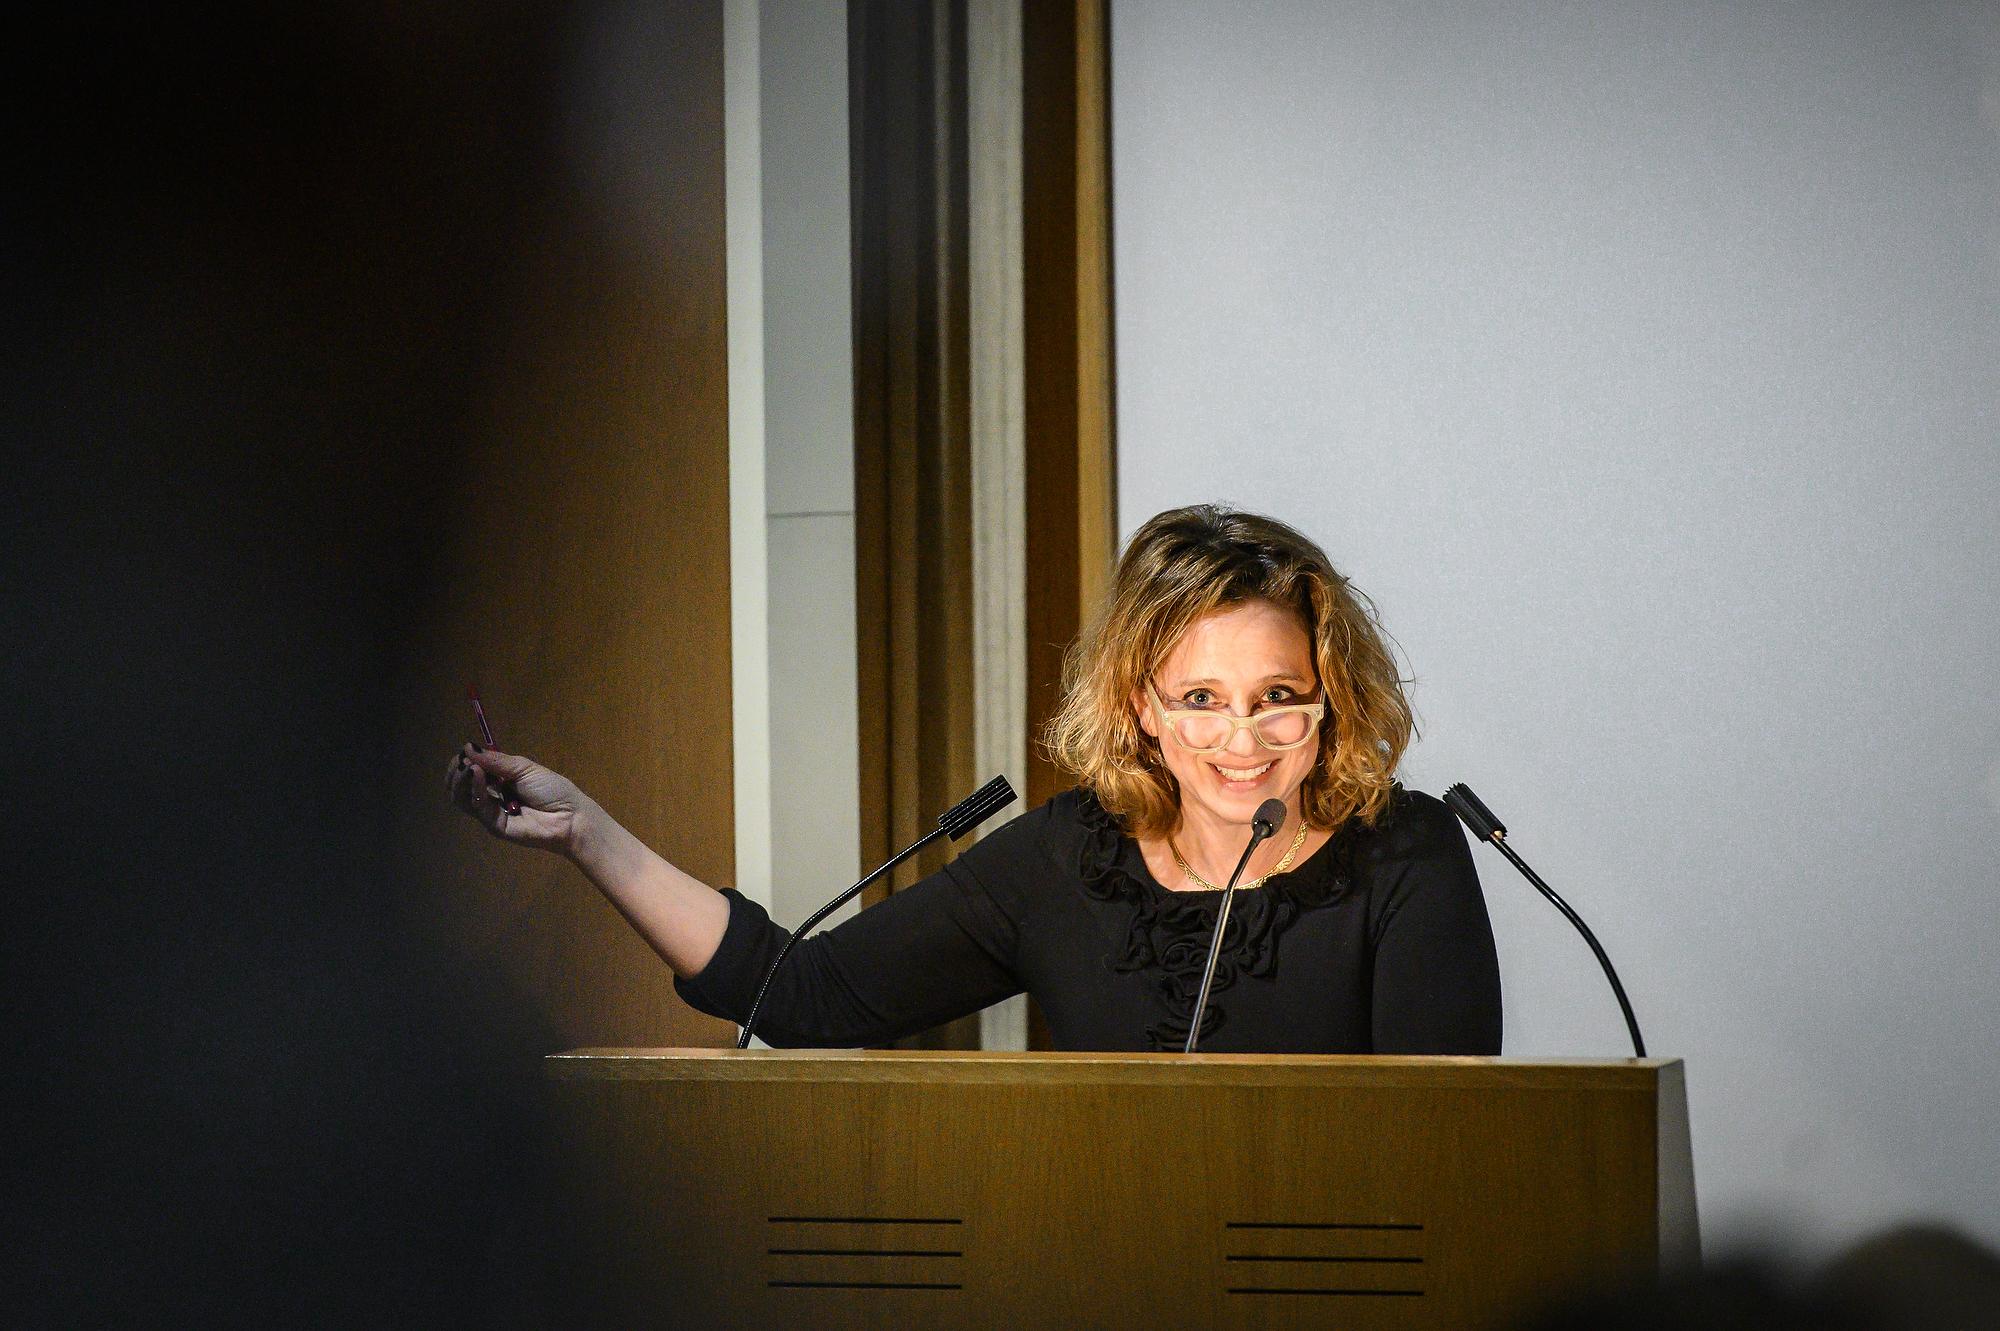 Jennifer Ratner-Rosenhagen standing behind a podium, speaking into 3 microphones